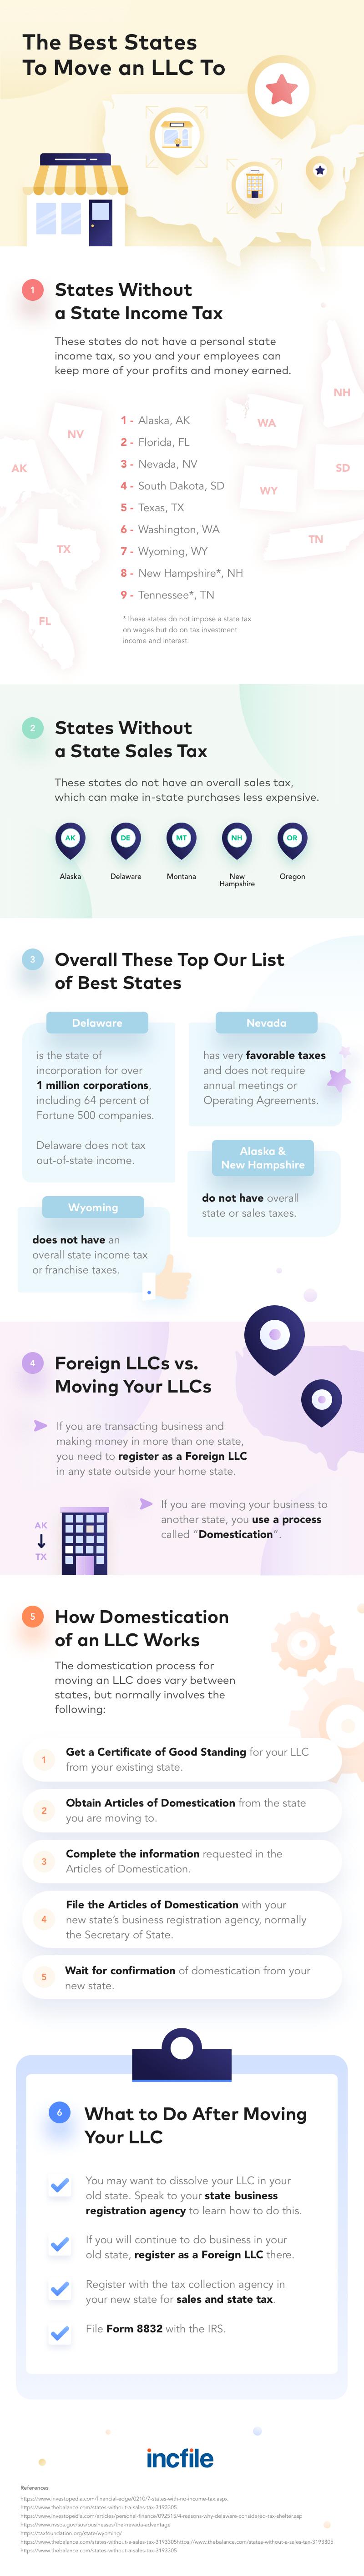 best-states-llc-infographic-plaza